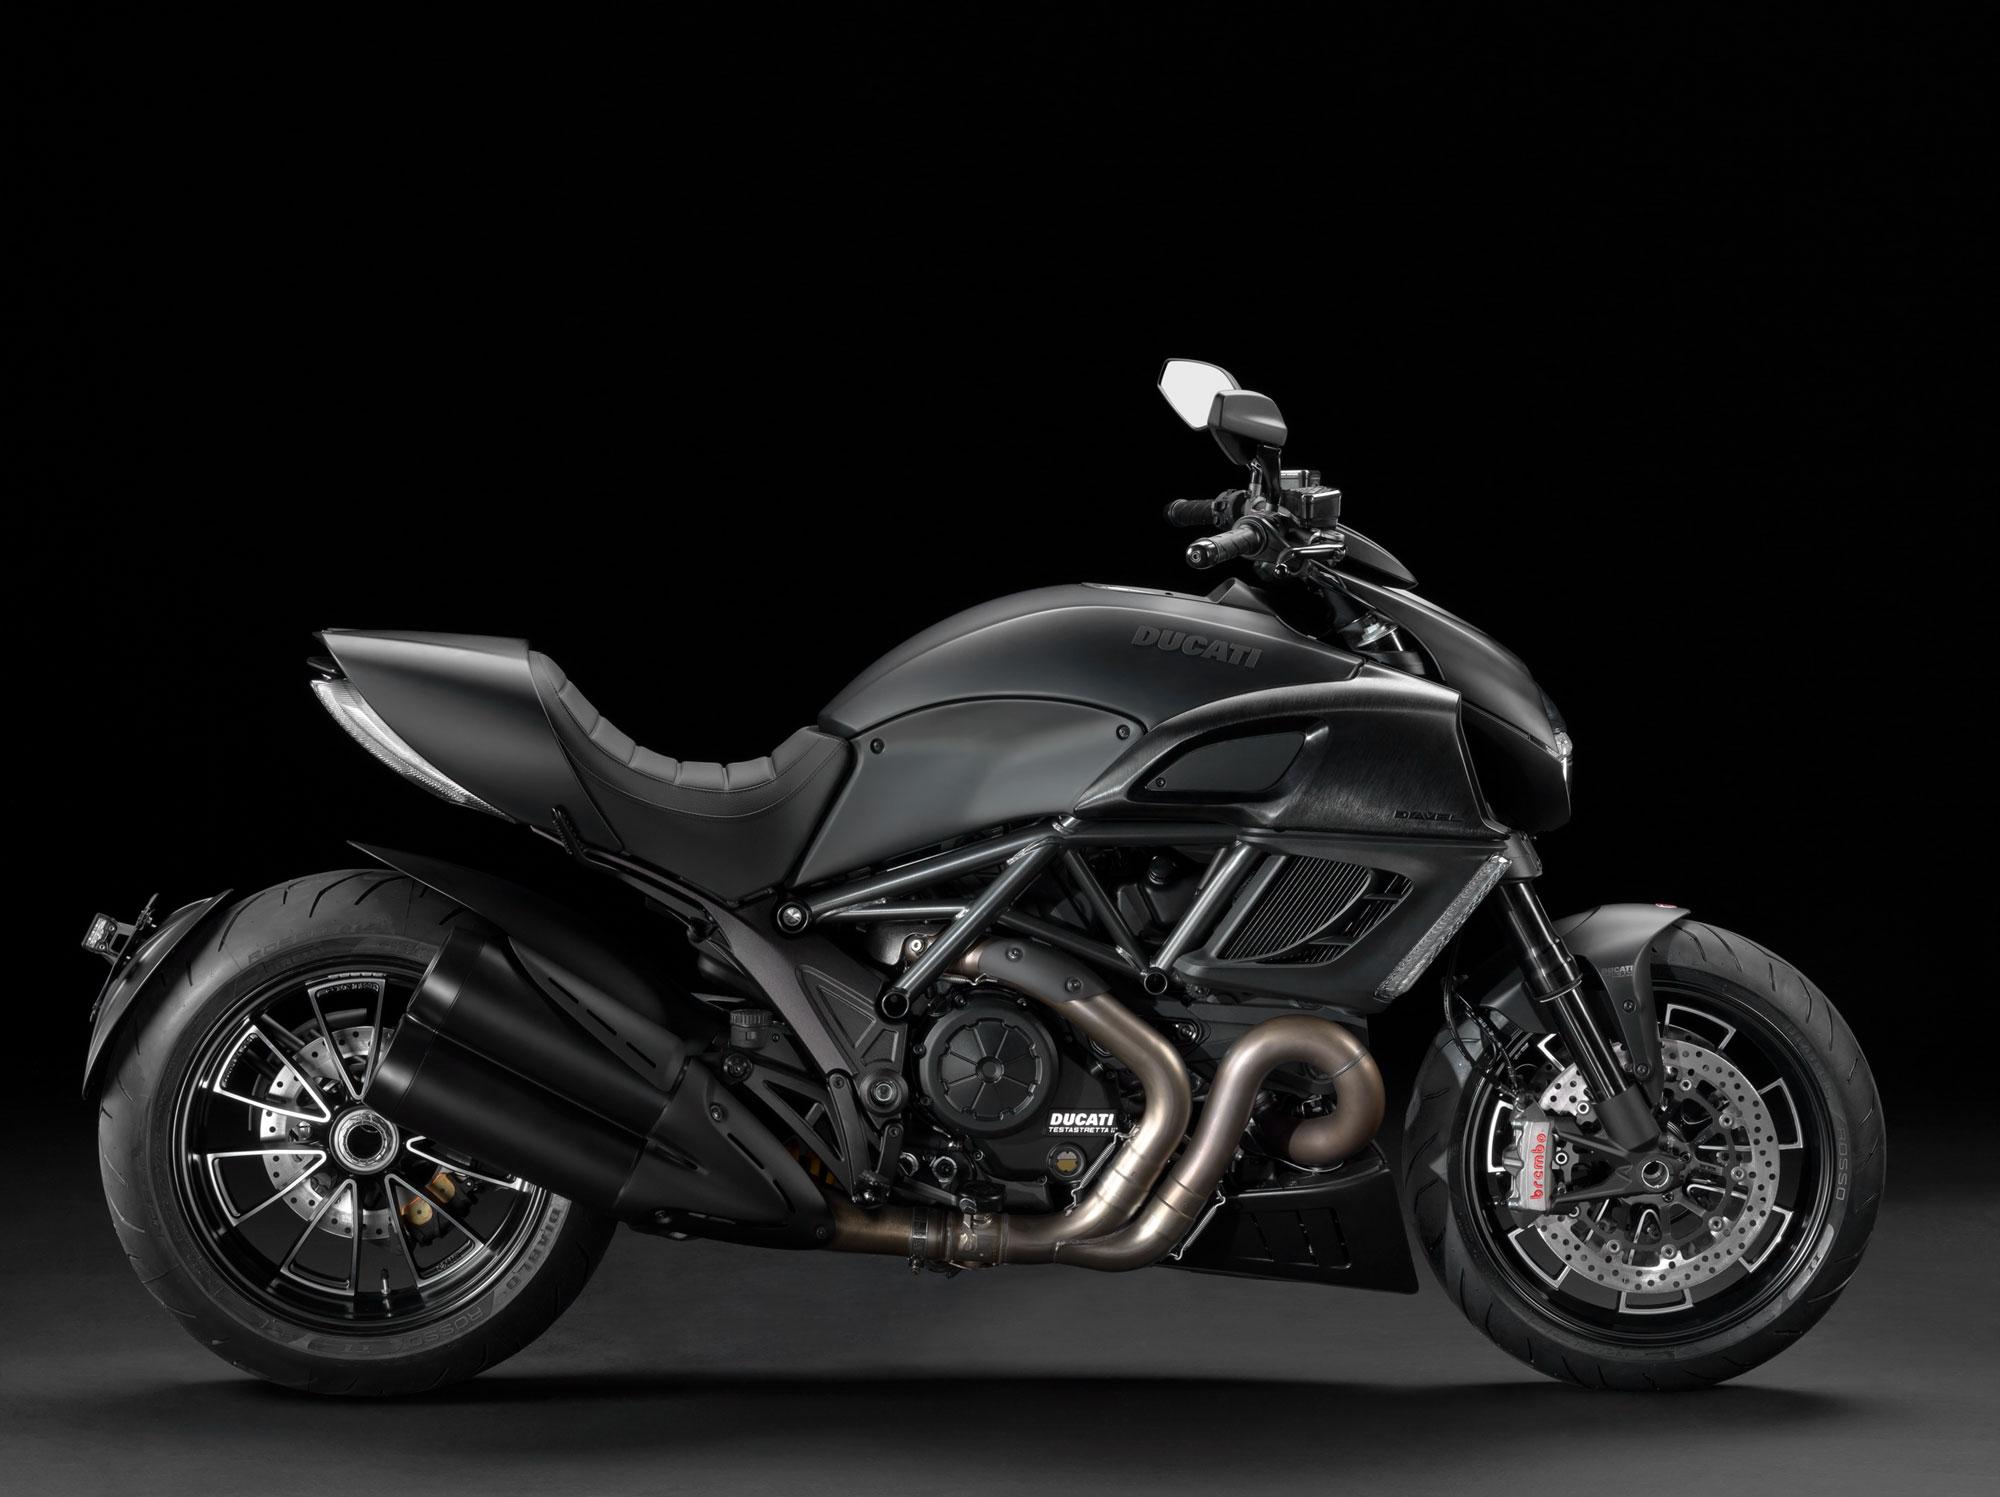 2013 Ducati Diavel Dark wallpaper 2000x1497 86955 WallpaperUP 2000x1497